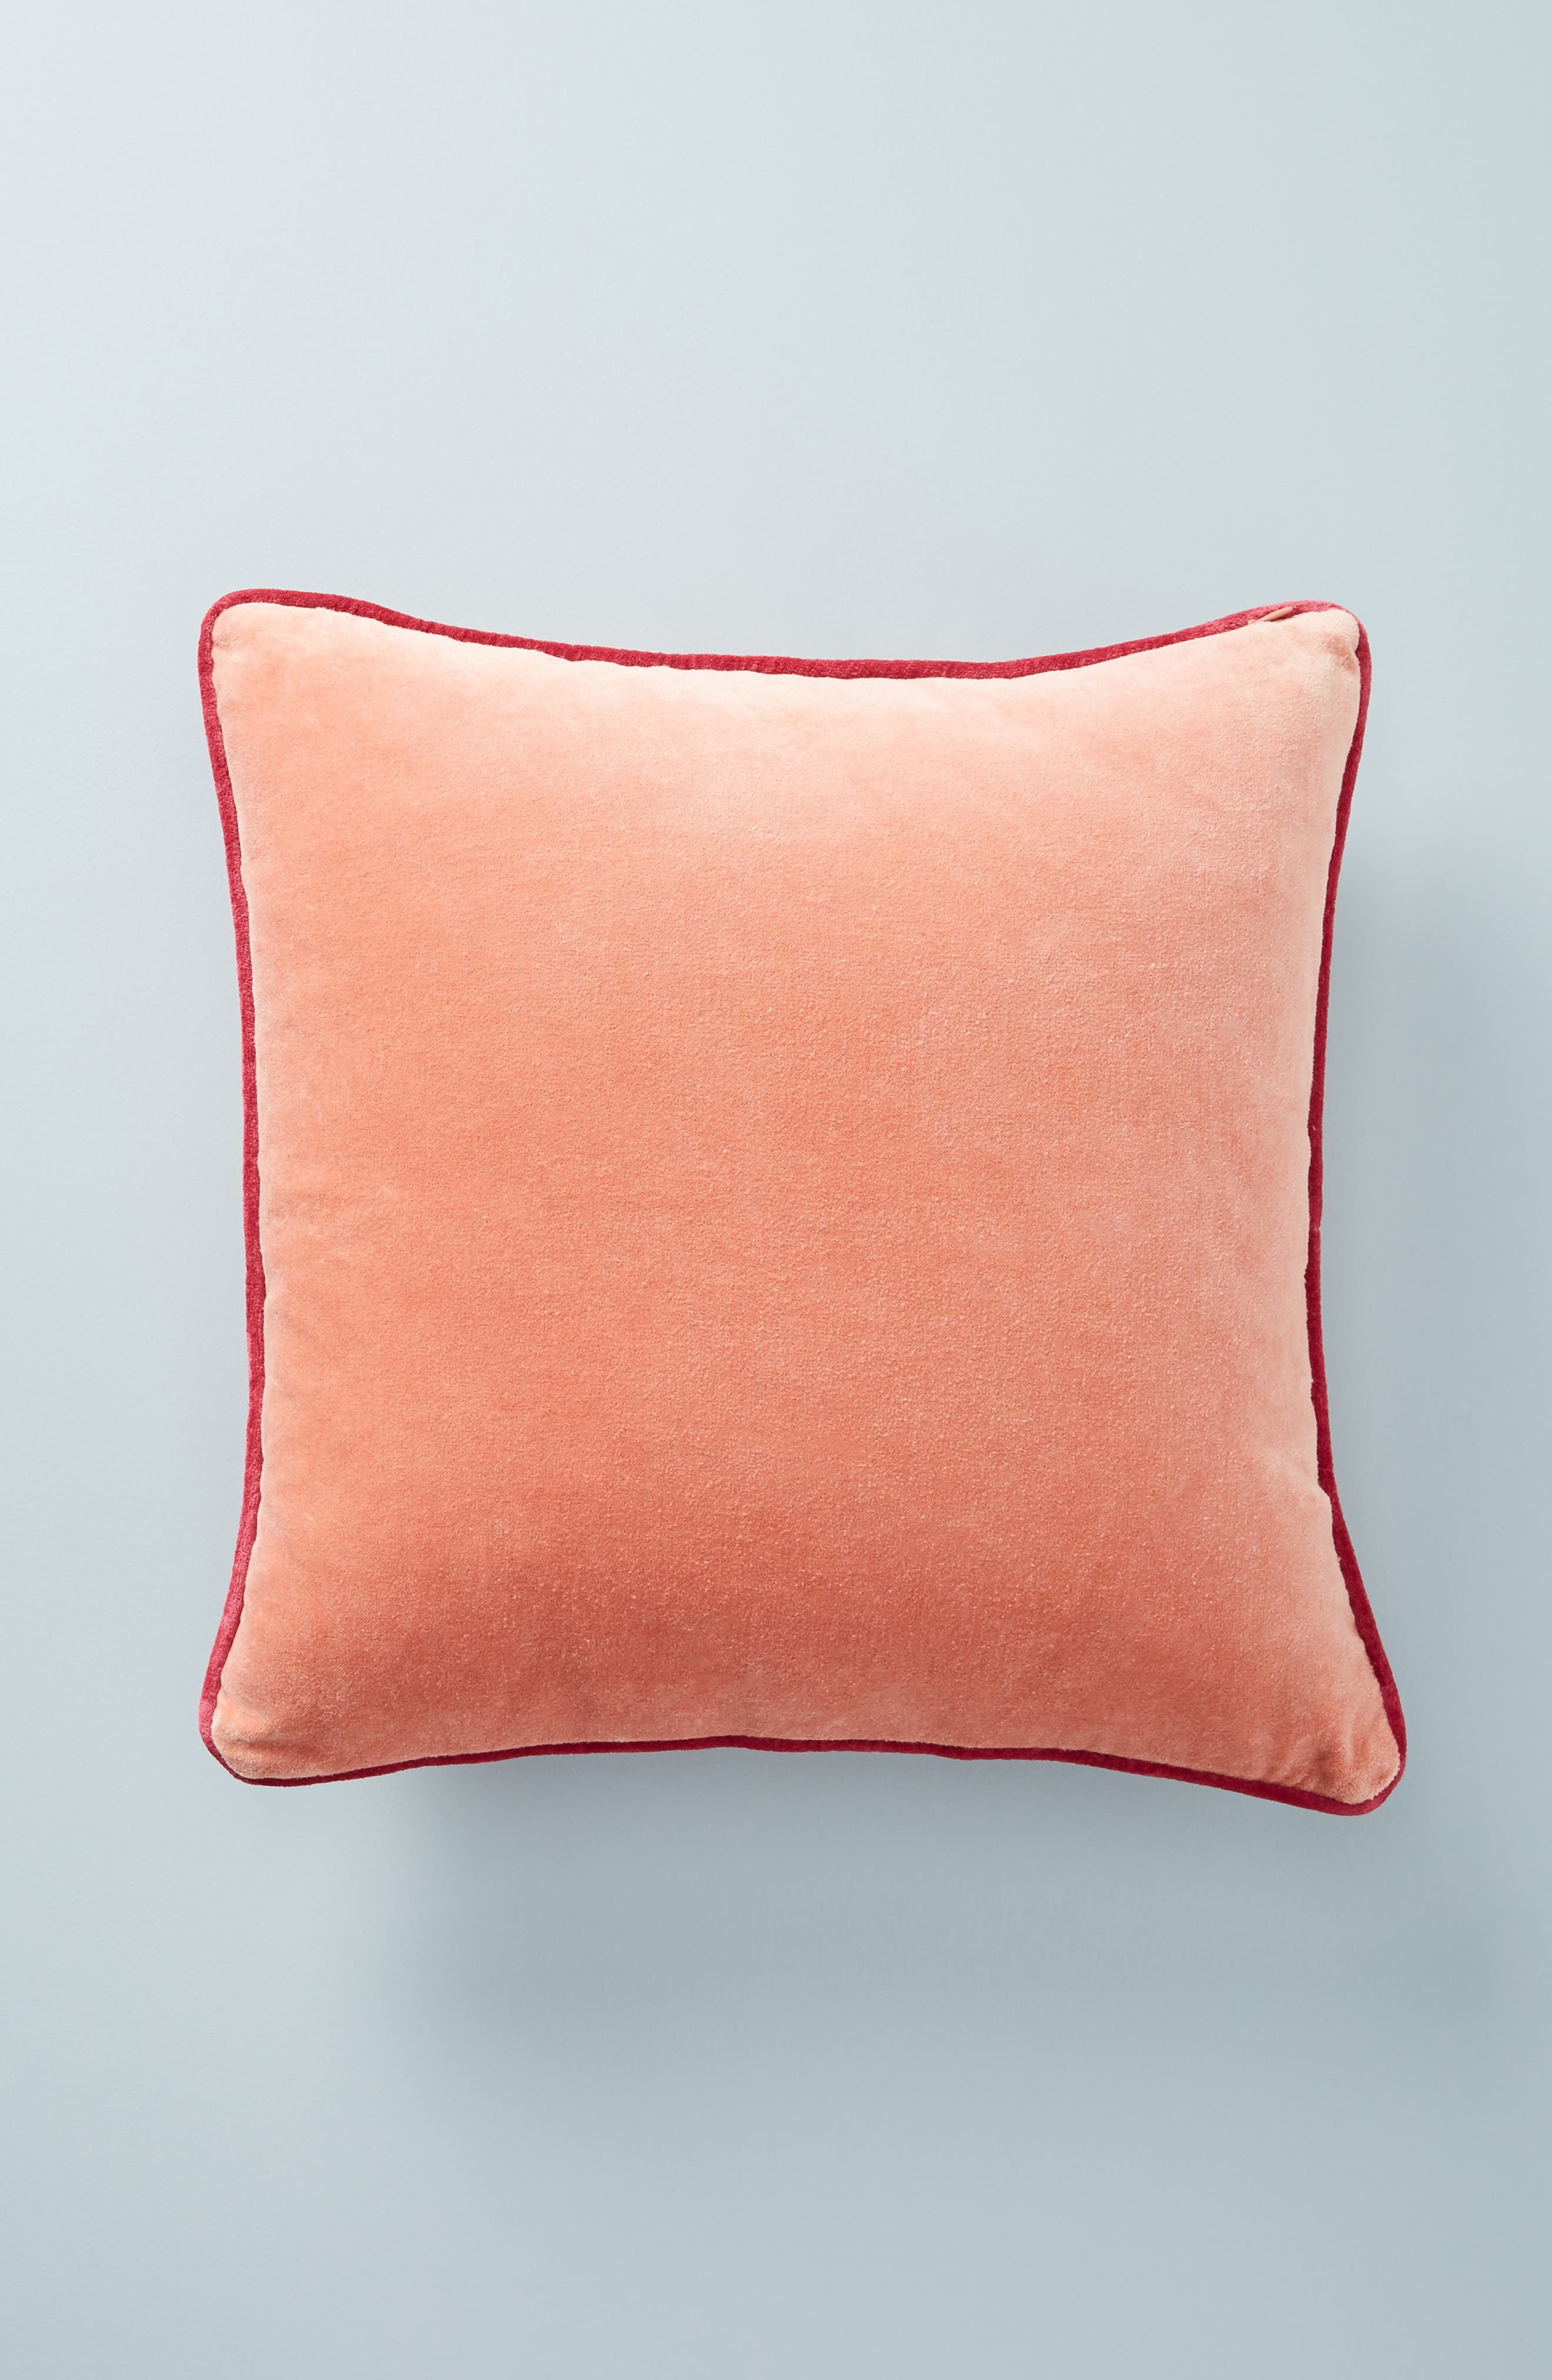 Confetti Velvet Accent Pillow,                             Alternate thumbnail 2, color,                             893